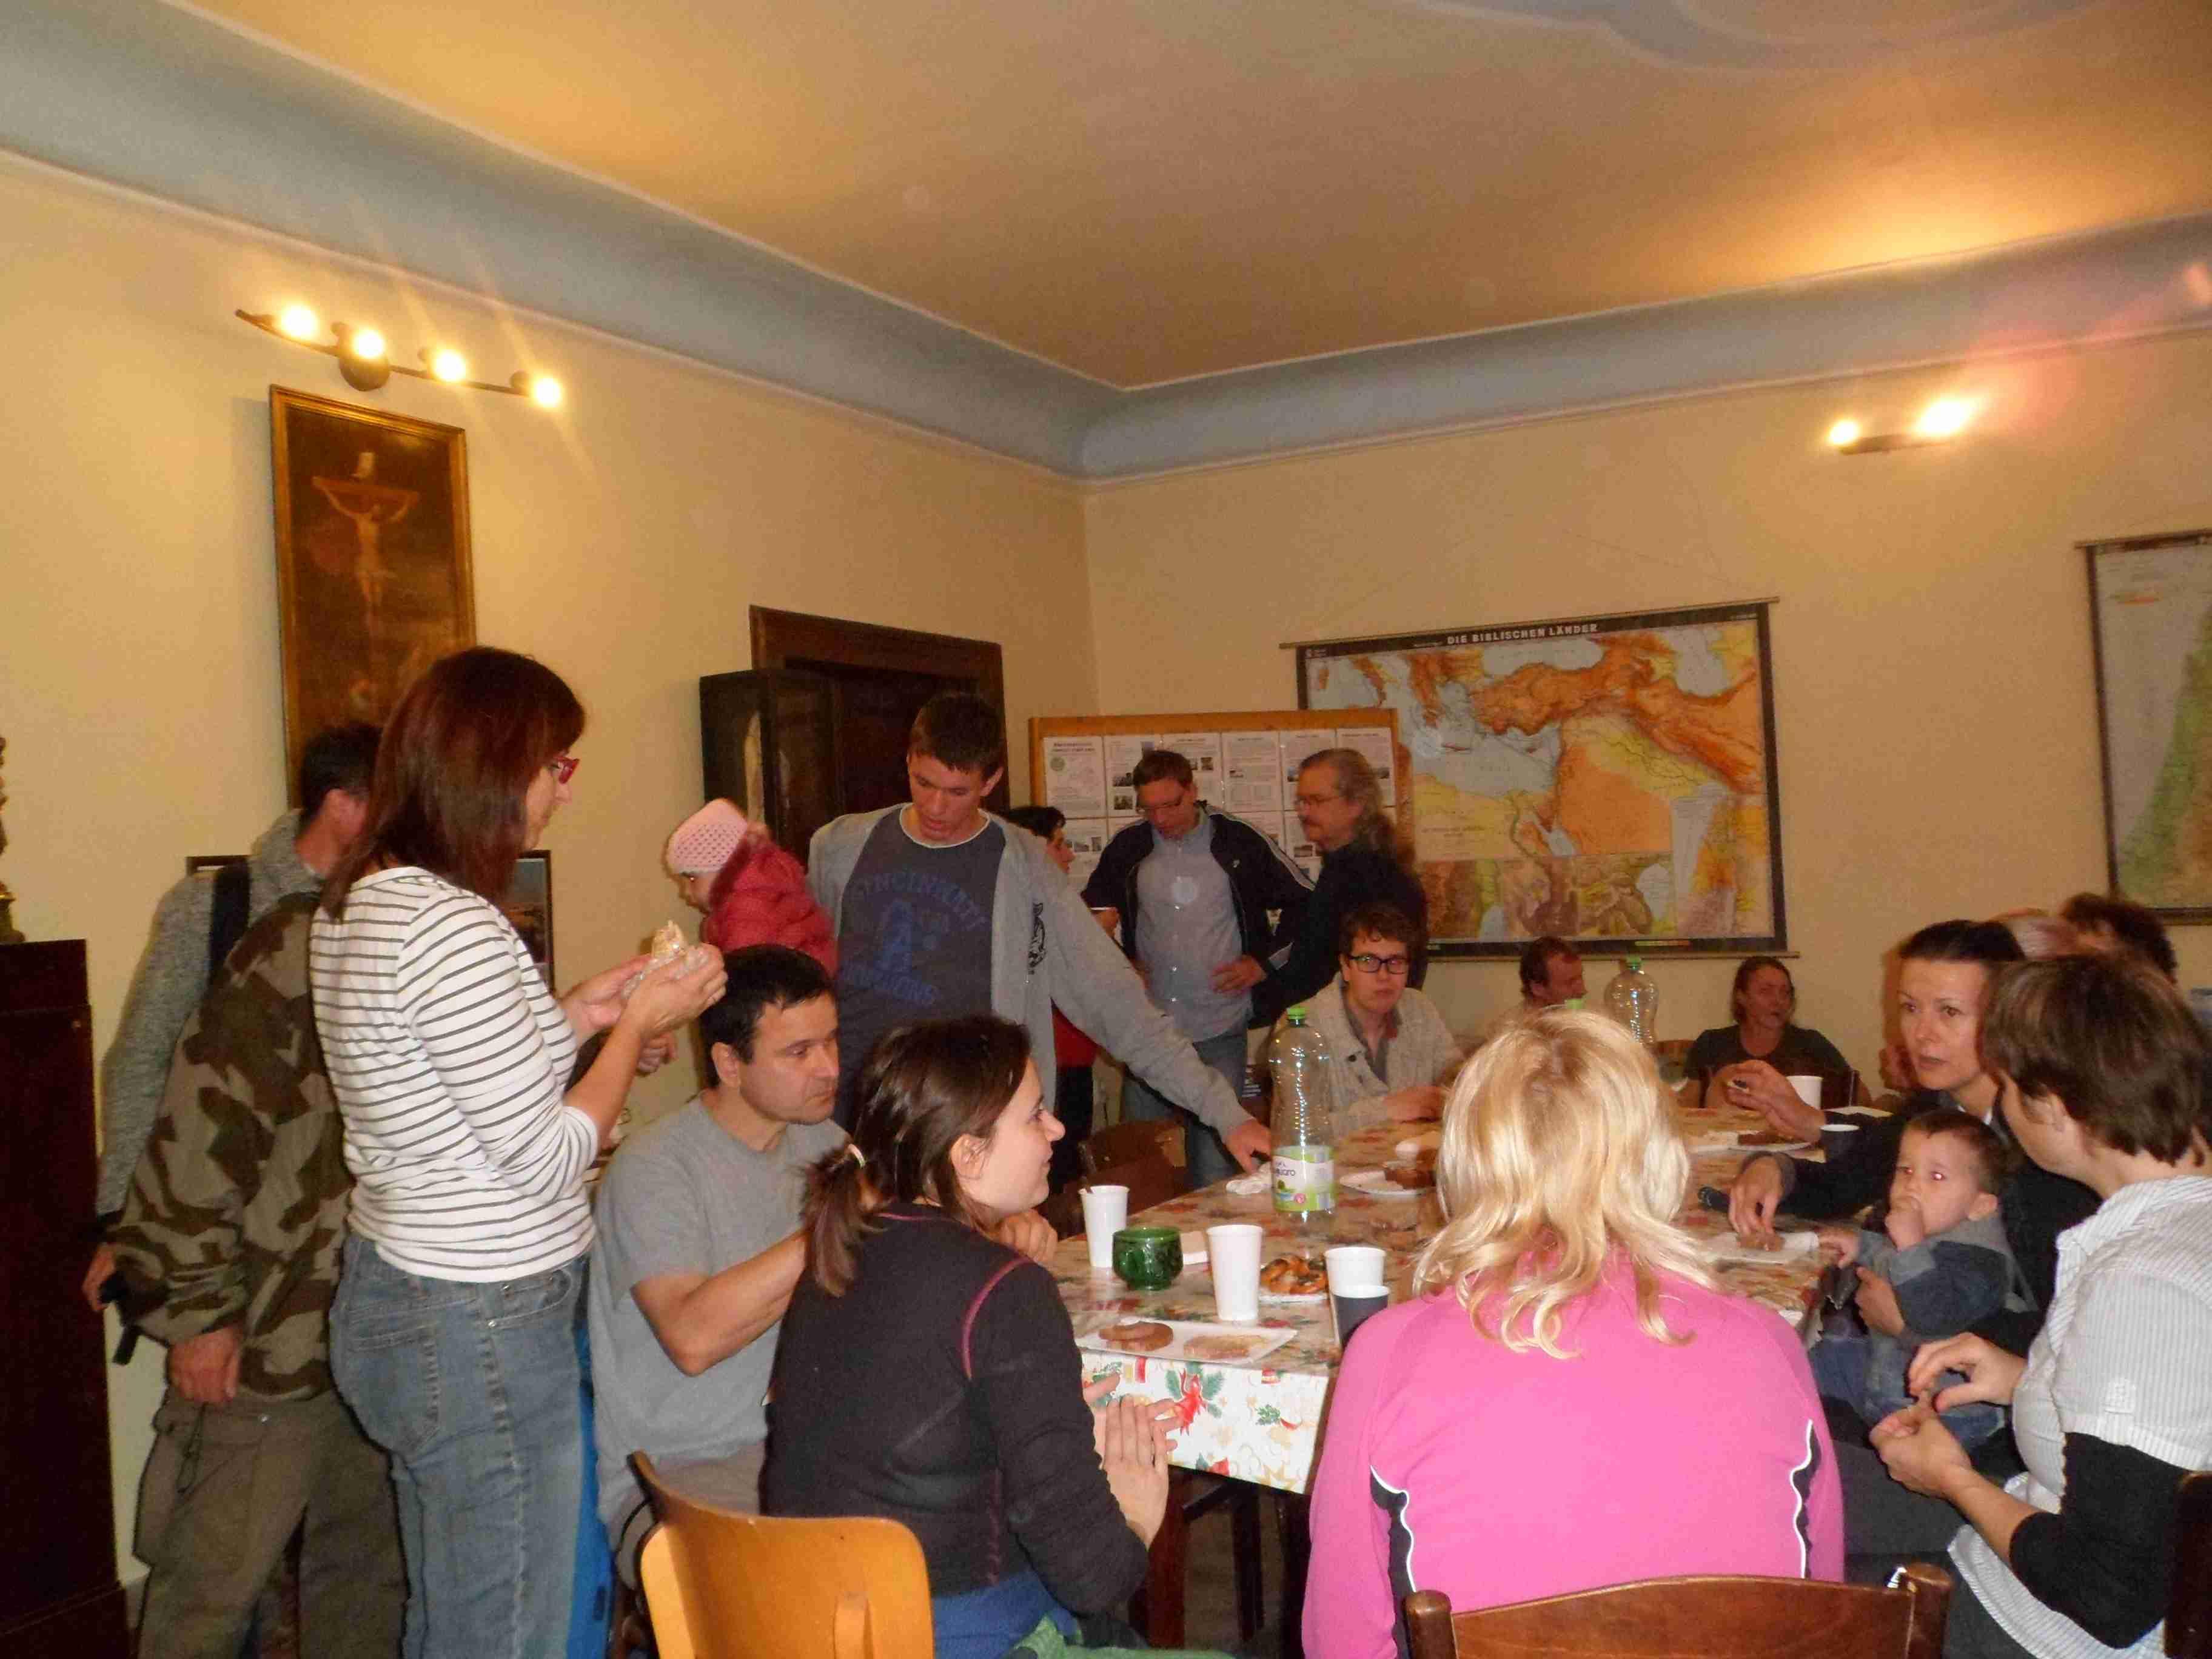 pouť ke sv. Františku 2014 - sobota - 3